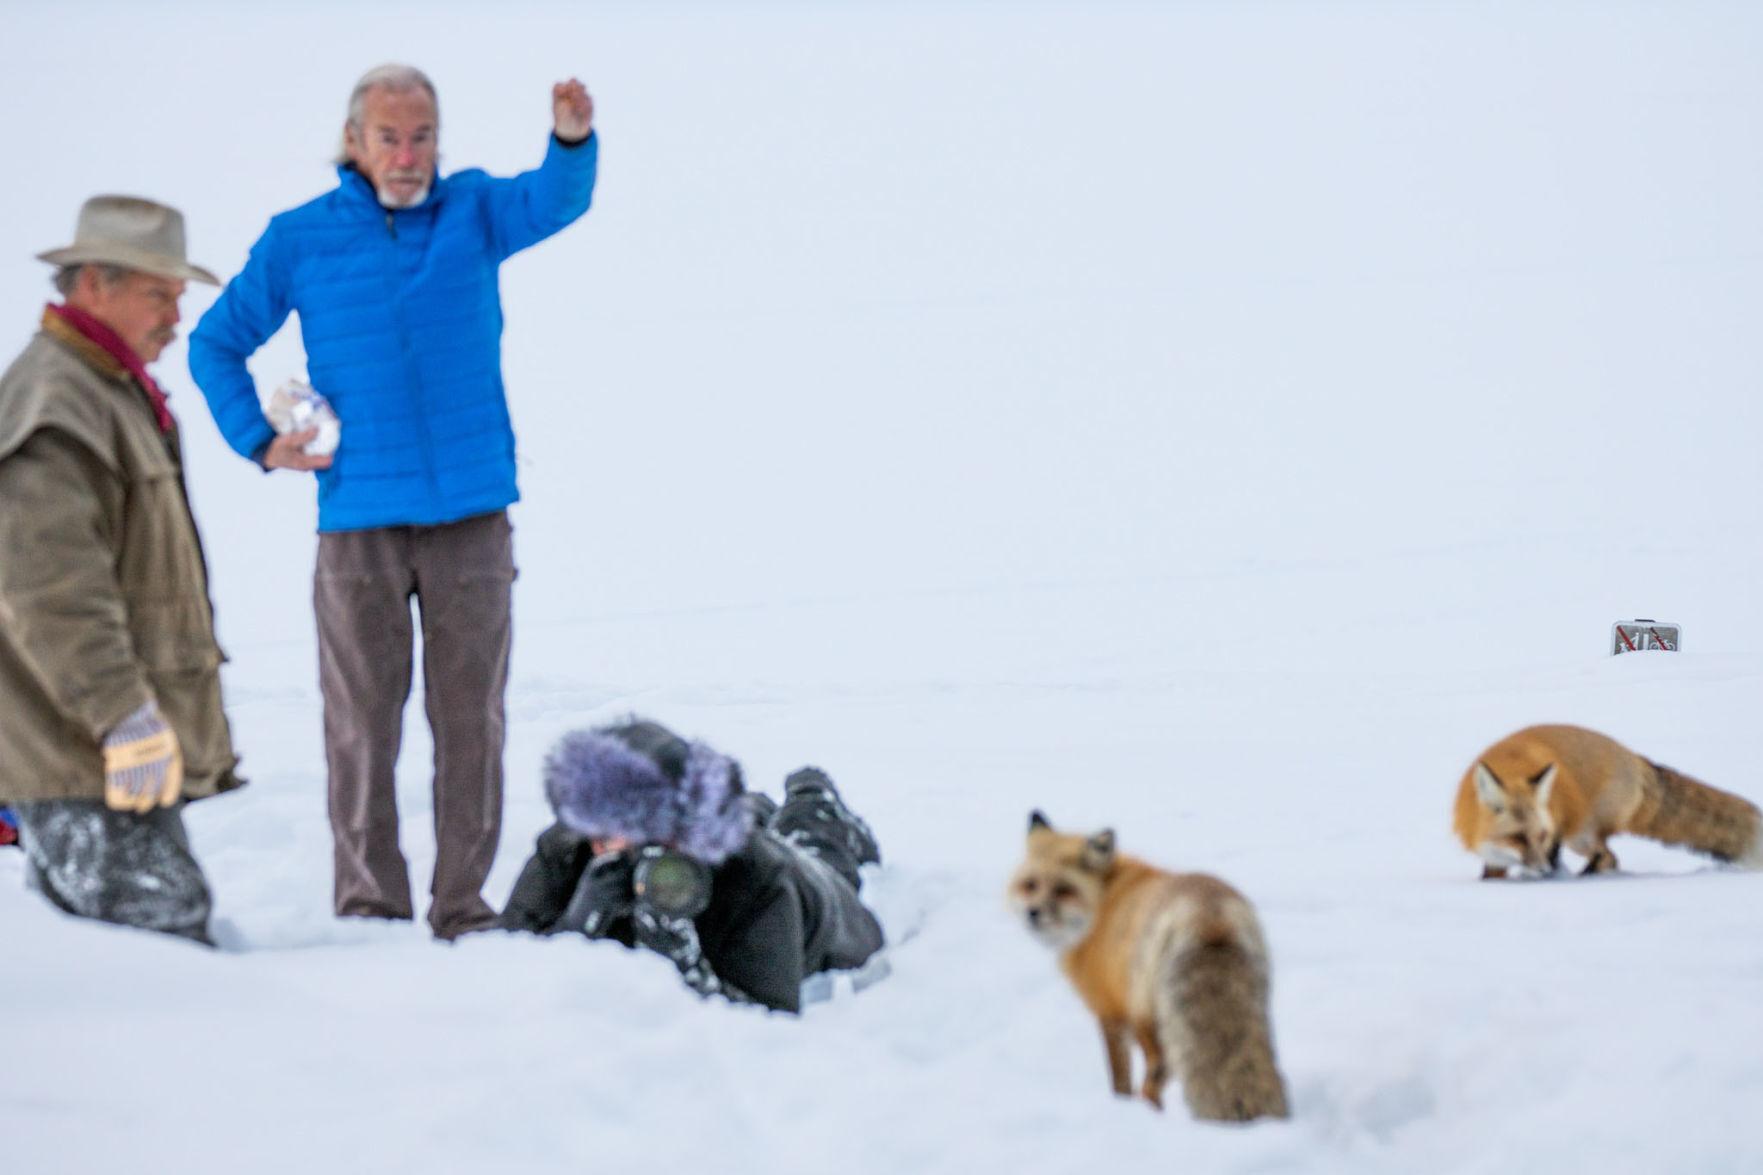 World's Highest Paid Wildlife Photographer Caught Endangering Wildlife